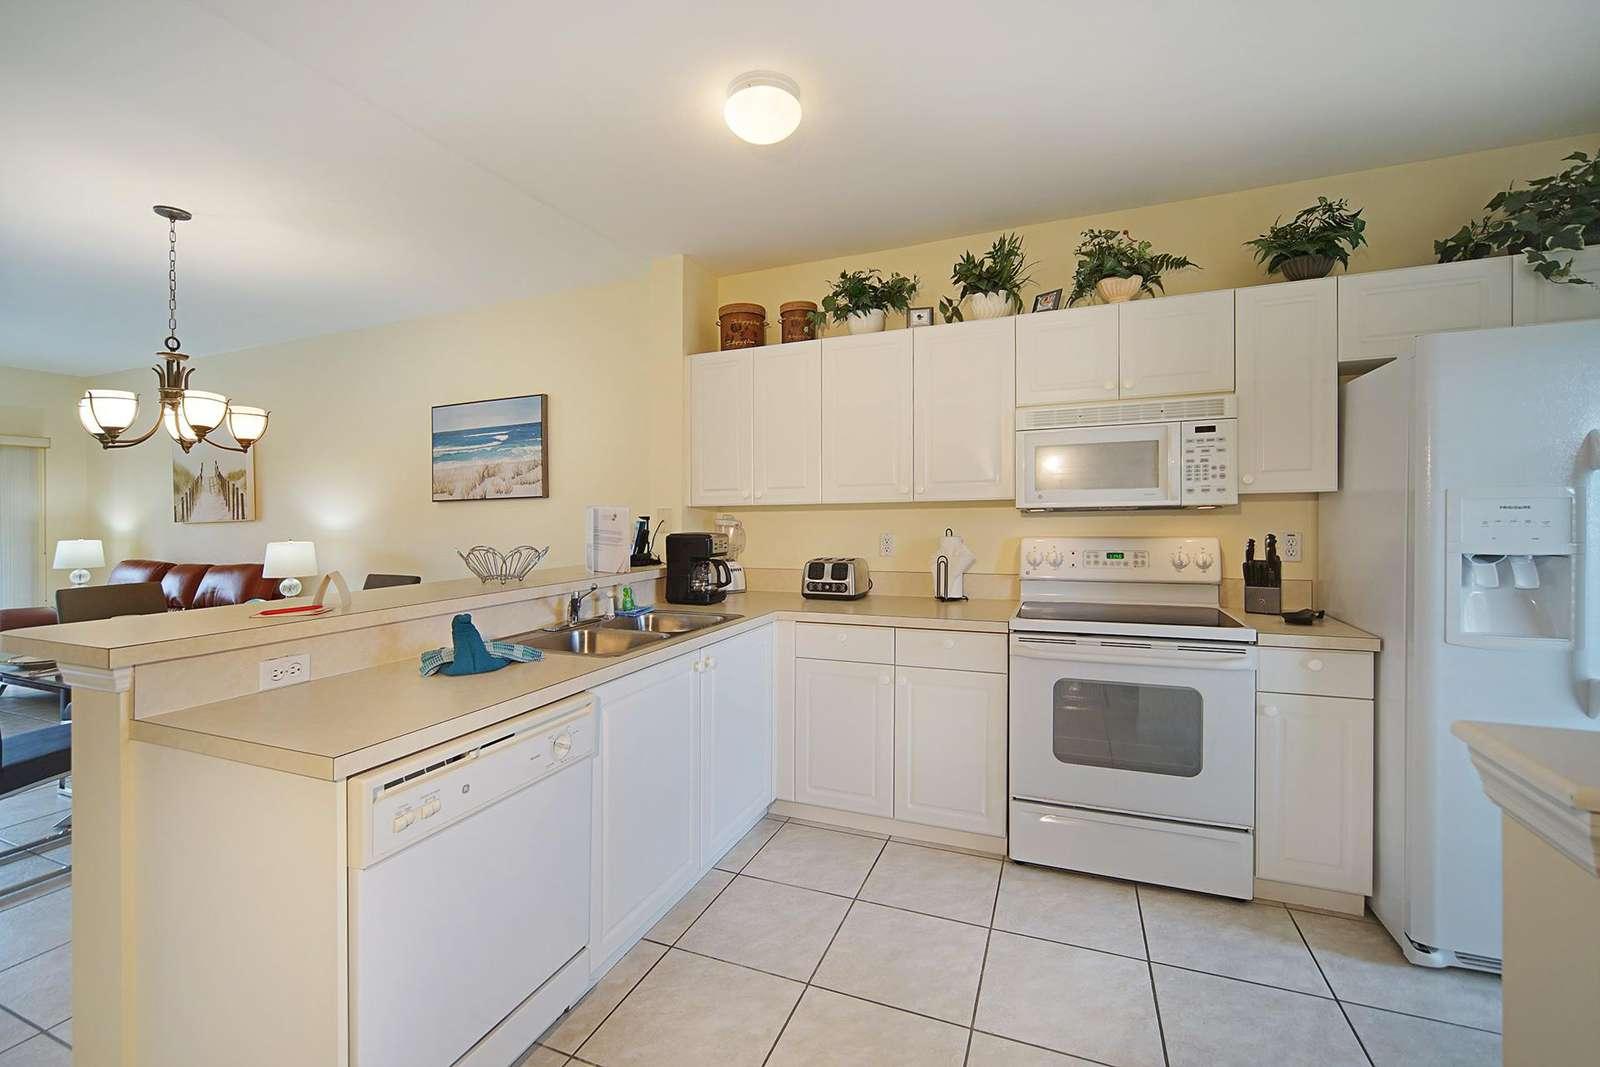 Wischis Florida Home - Vacation Rentals Naples I Property Management I Real Estate